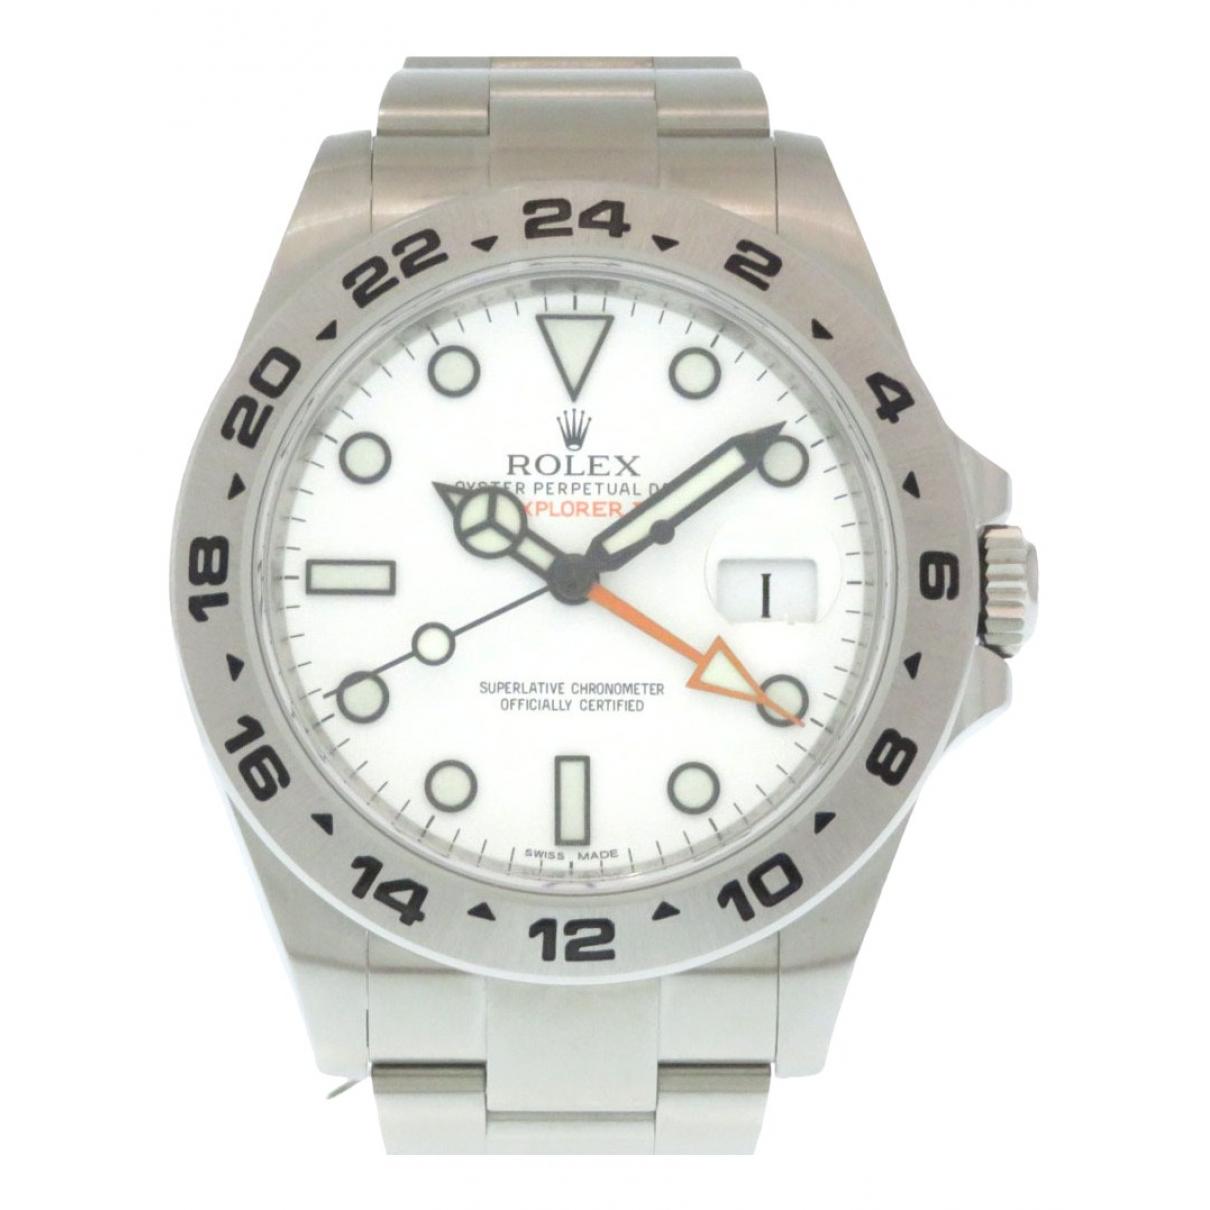 Relojes Explorer II 42mm Rolex